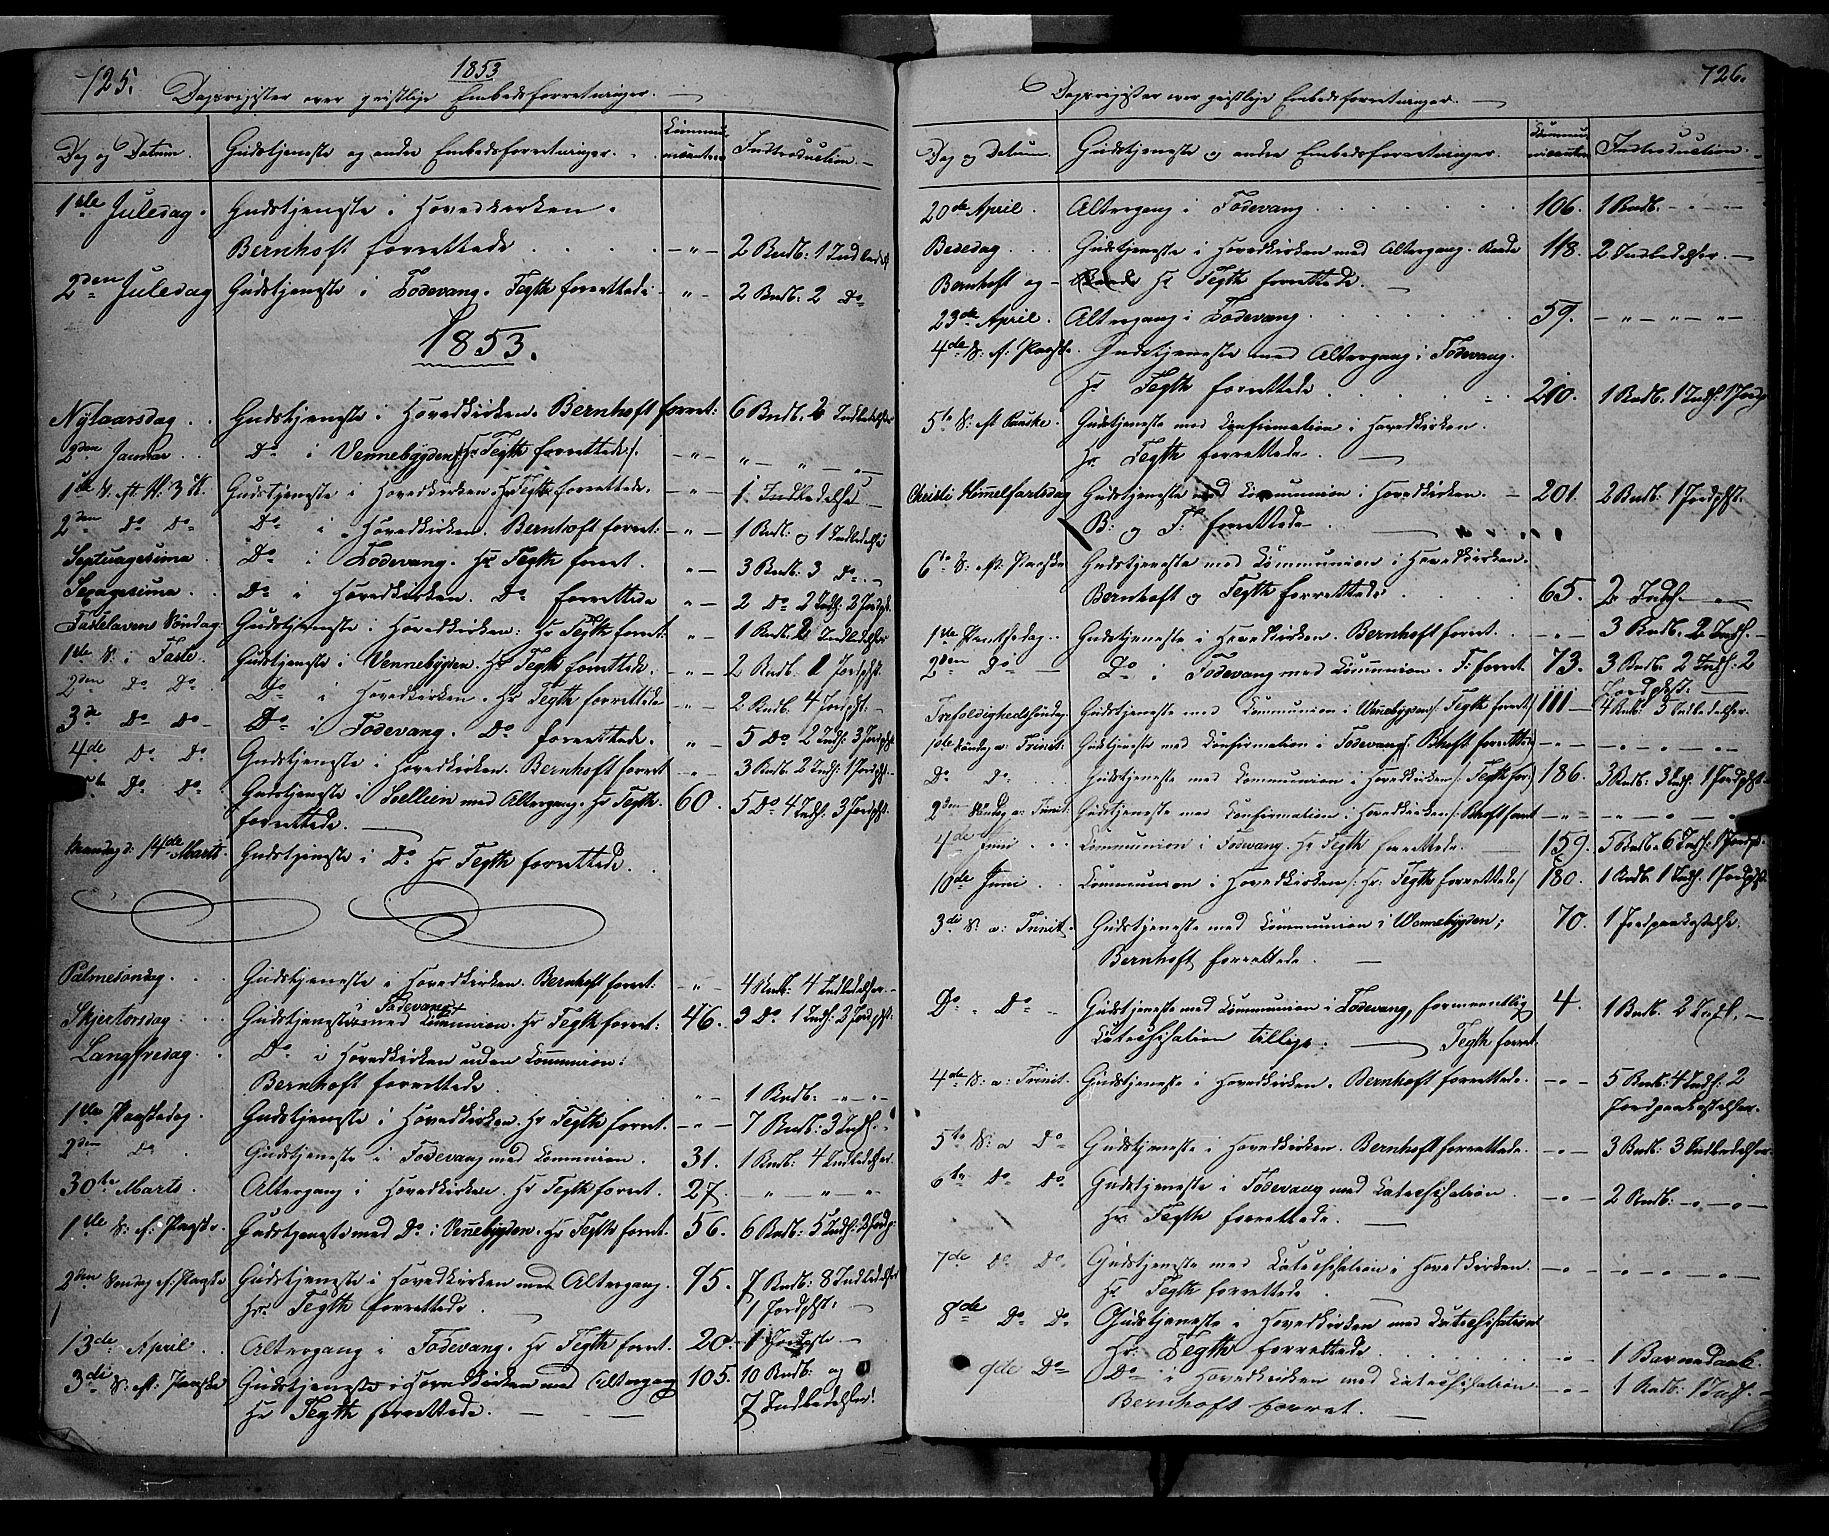 SAH, Ringebu prestekontor, Ministerialbok nr. 6, 1848-1859, s. 725-726